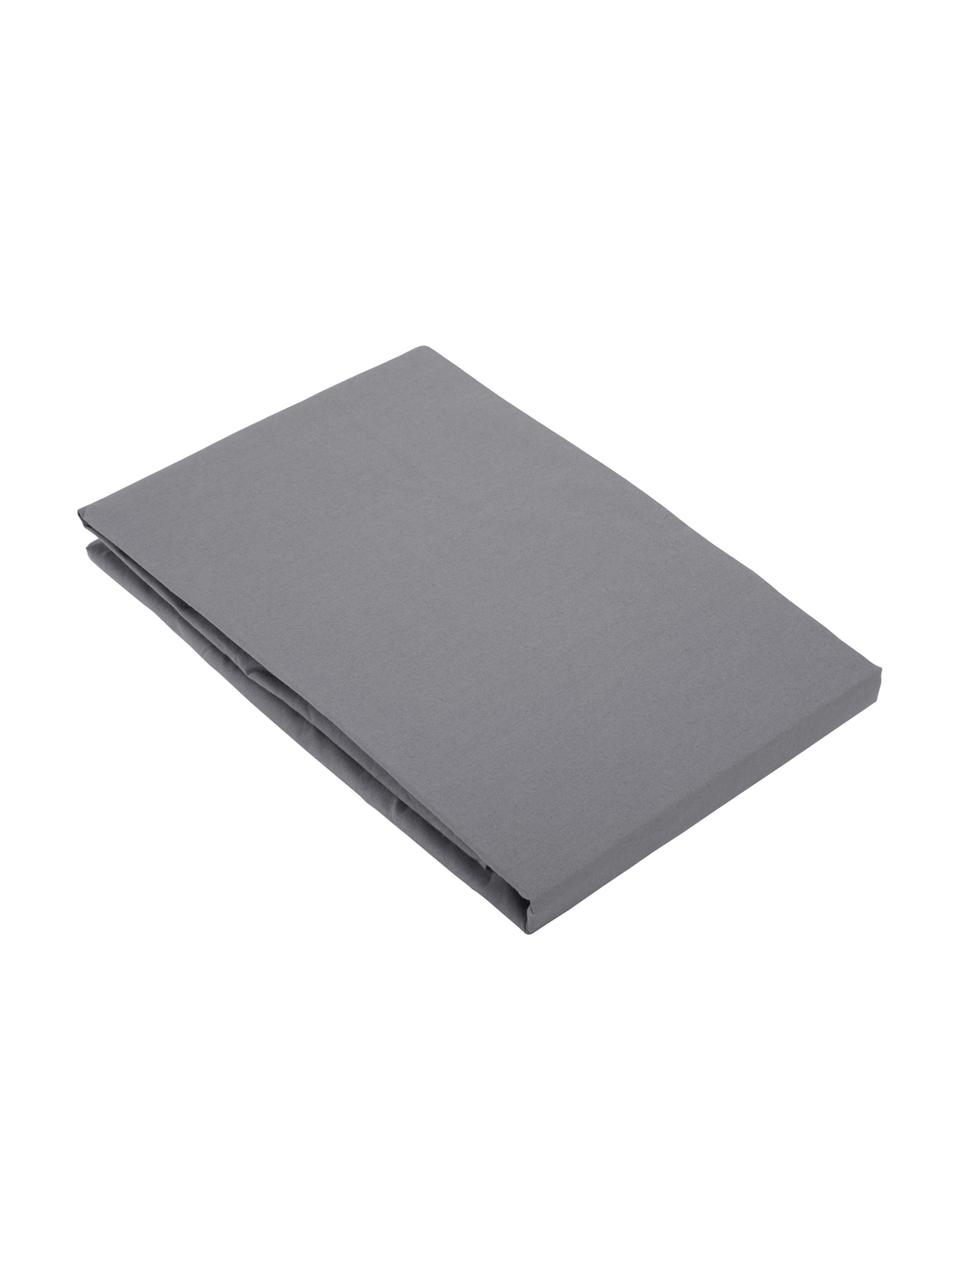 Lenzuolo con angoli in percalle Elsie, Tessuto: percalle, Grigio scuro, Larg. 180 x Lung. 200 cm